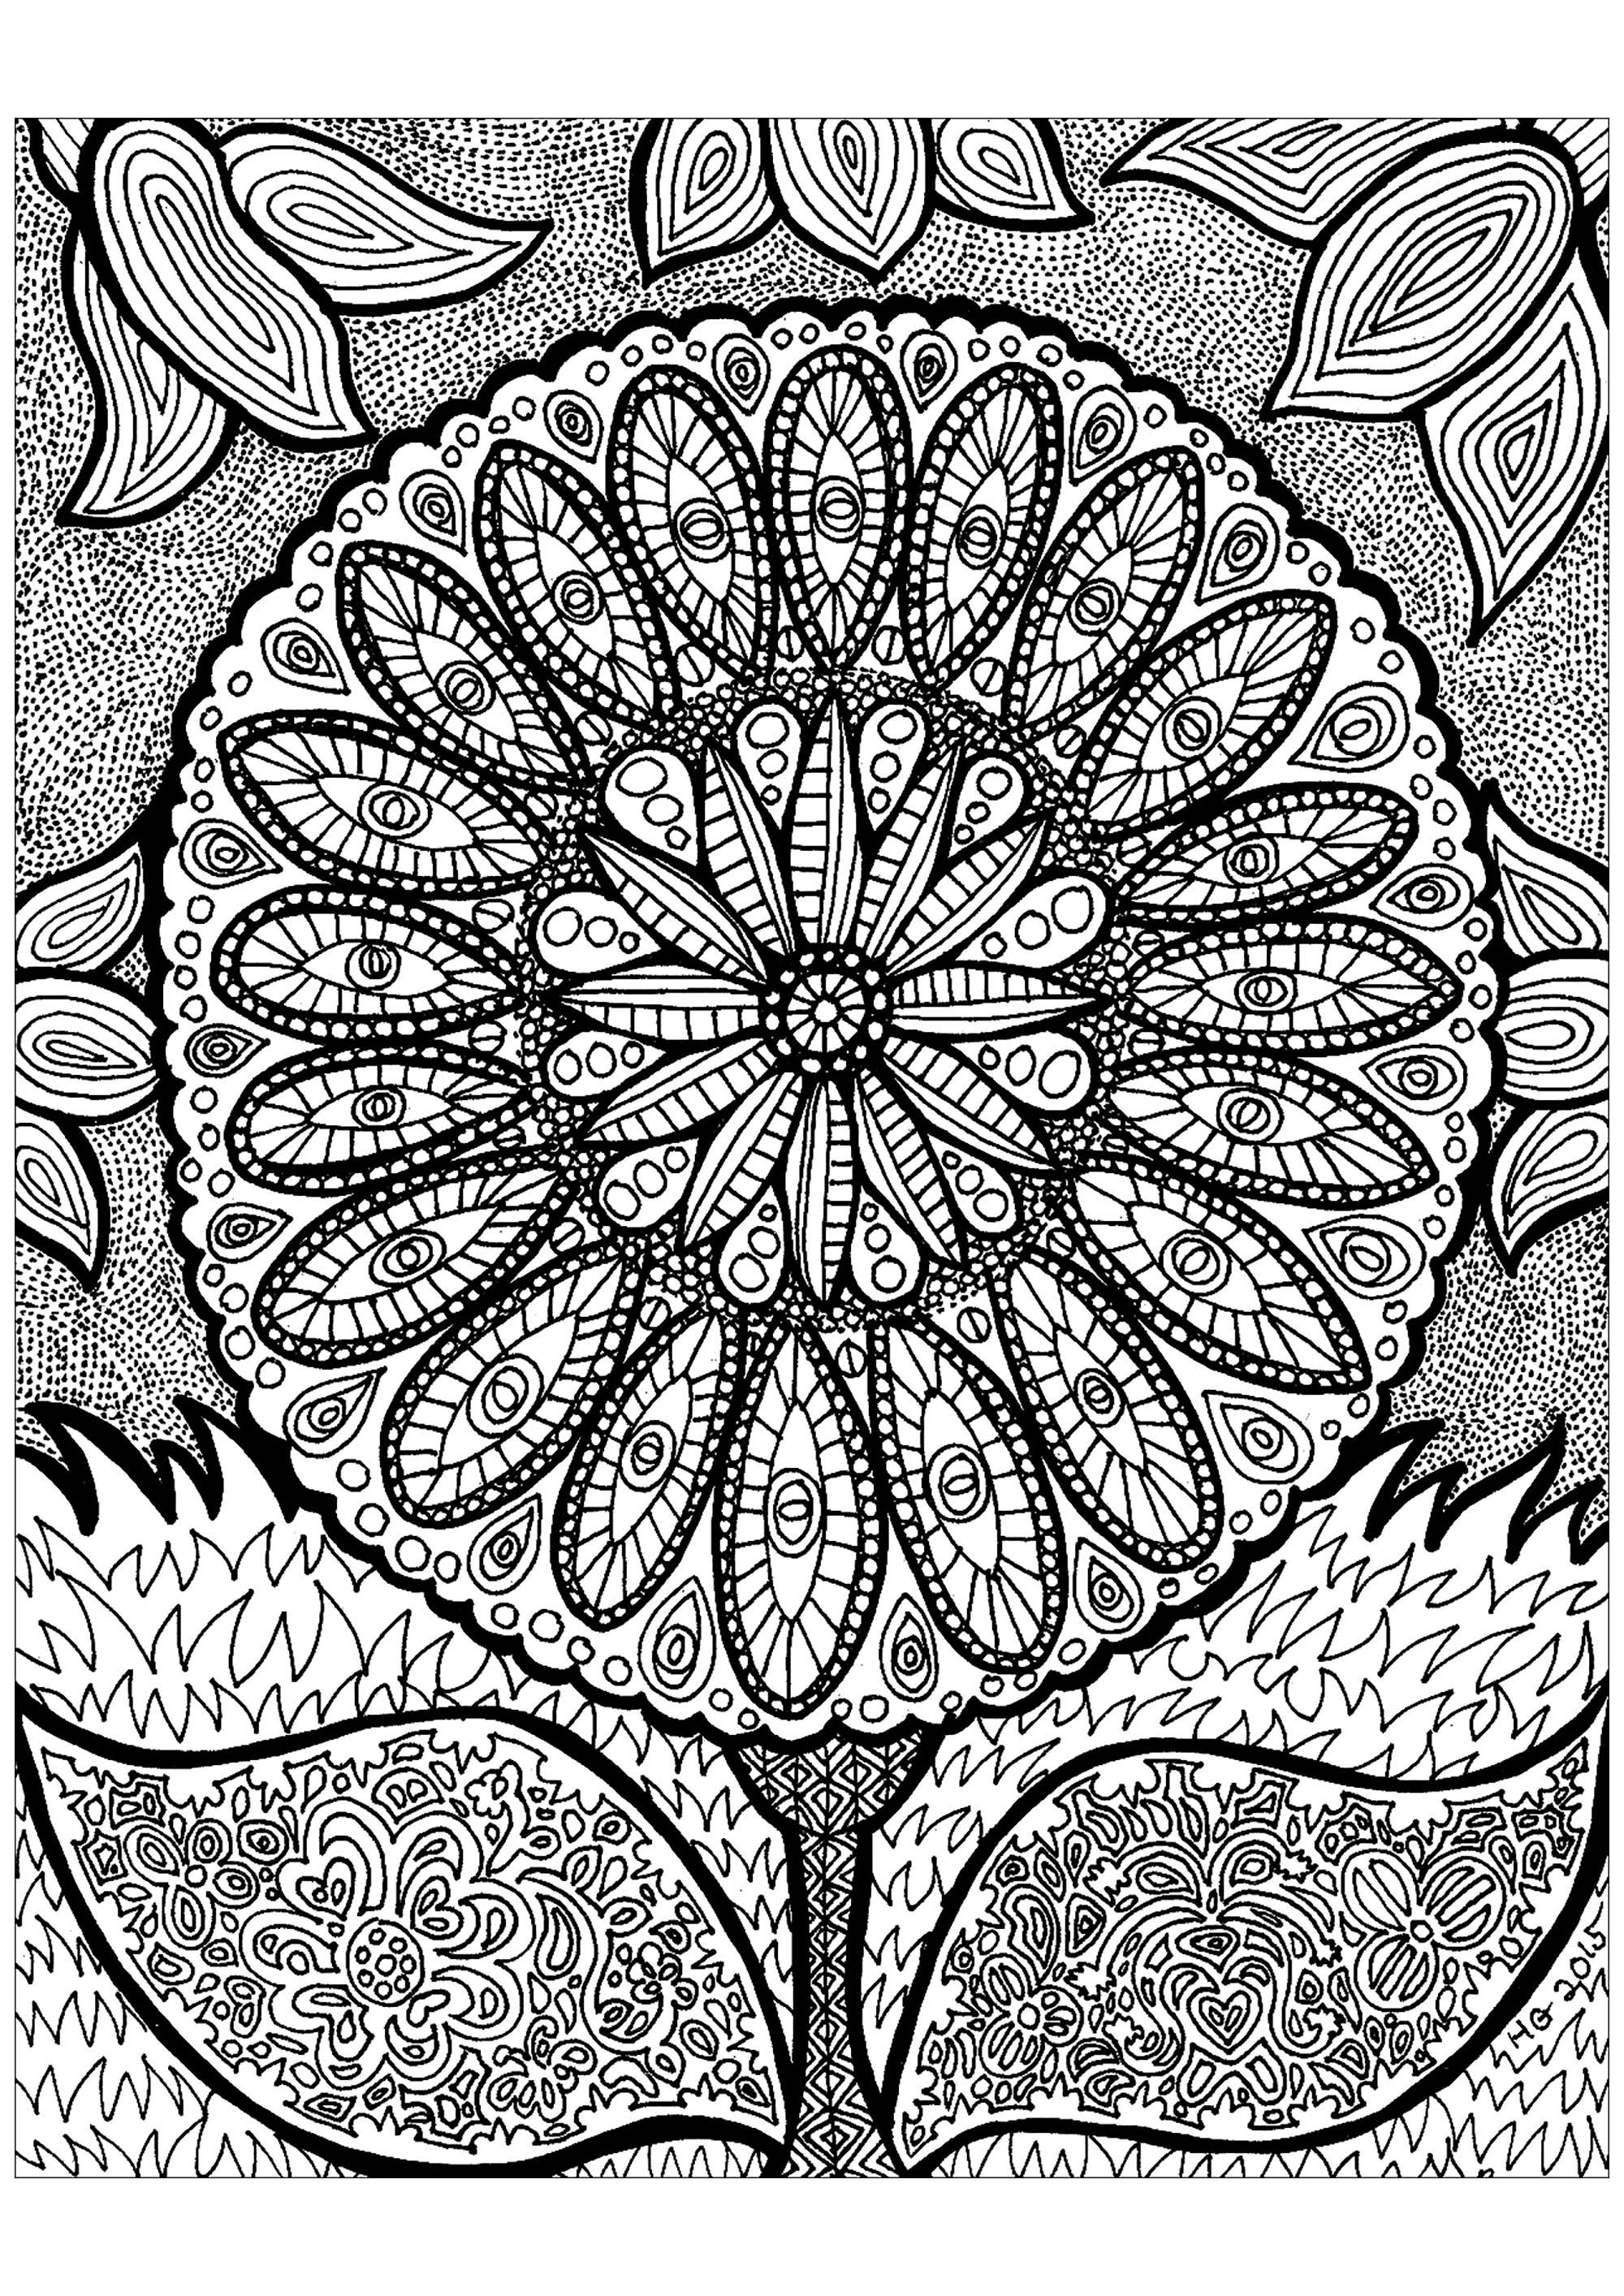 Flower Creative Coloring Pages Photo Album Sabadaphnecottage